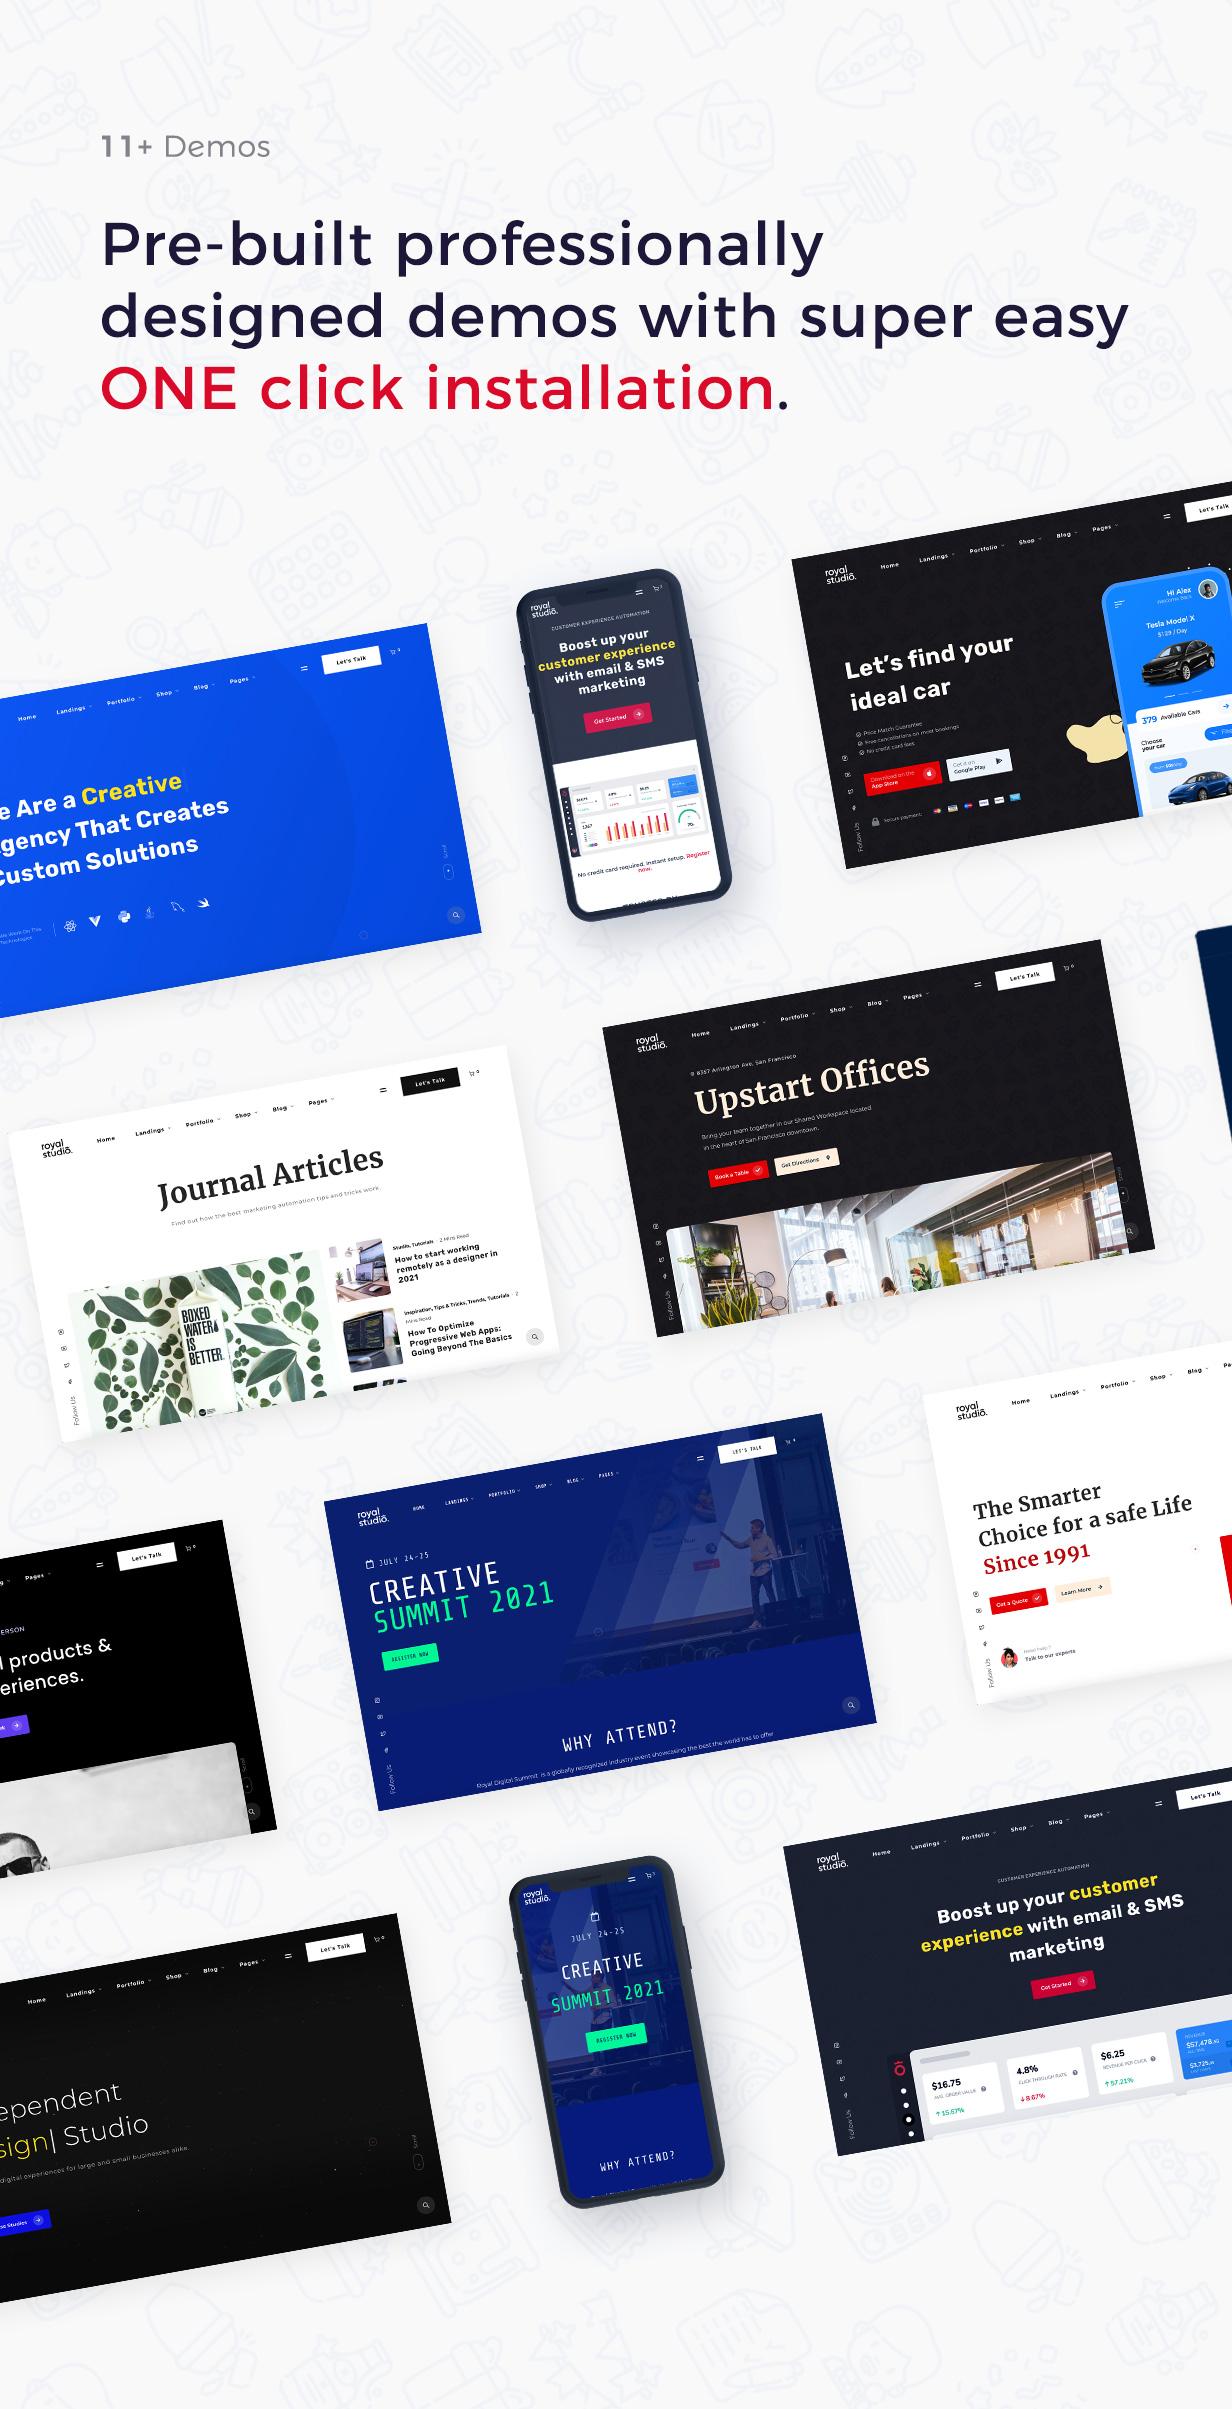 RoyalStudio - Agency & Marketing Theme - 4